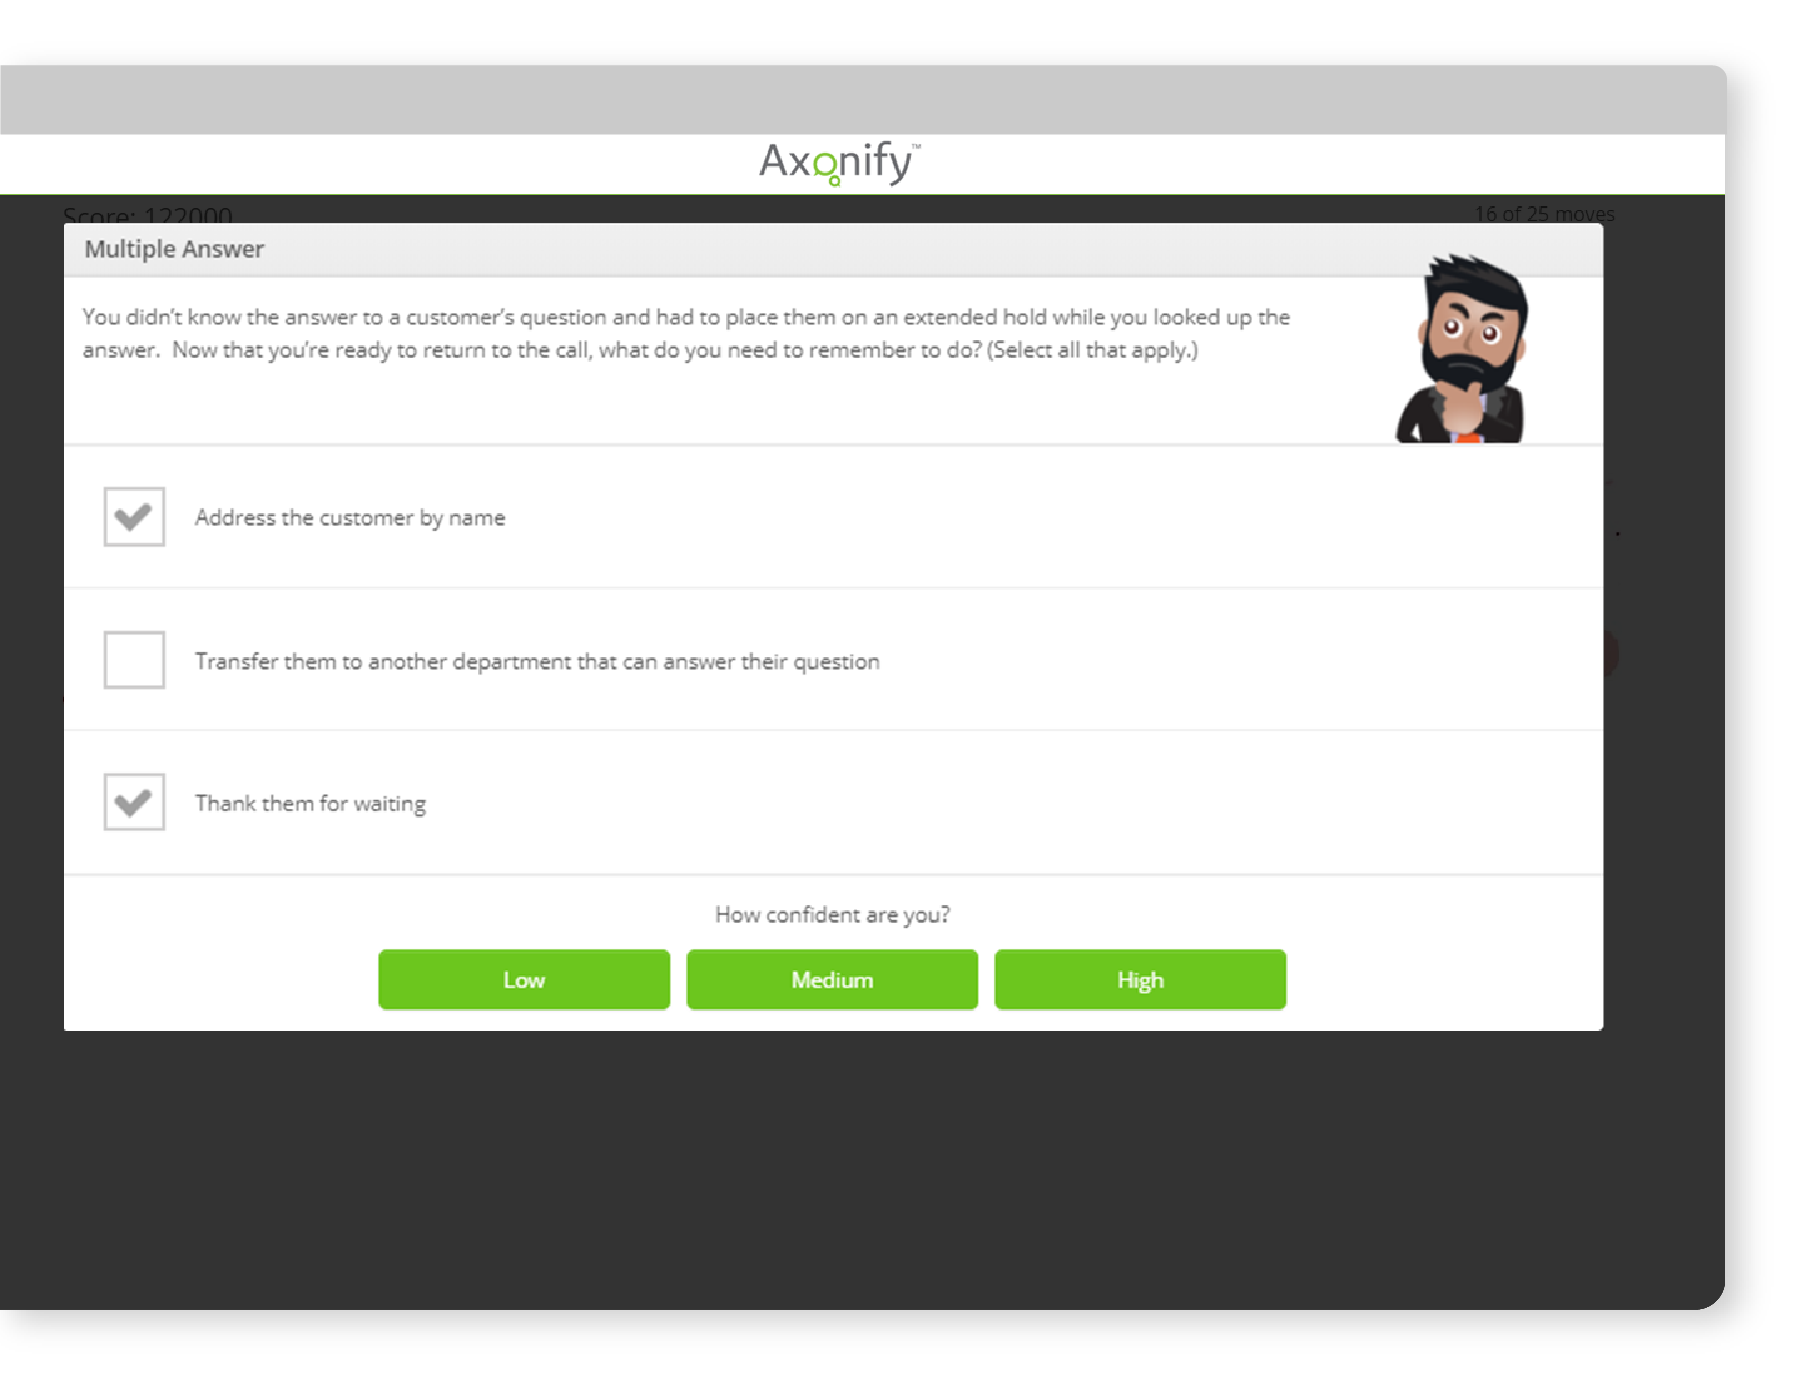 Contact Center Training- Platform Screenshot